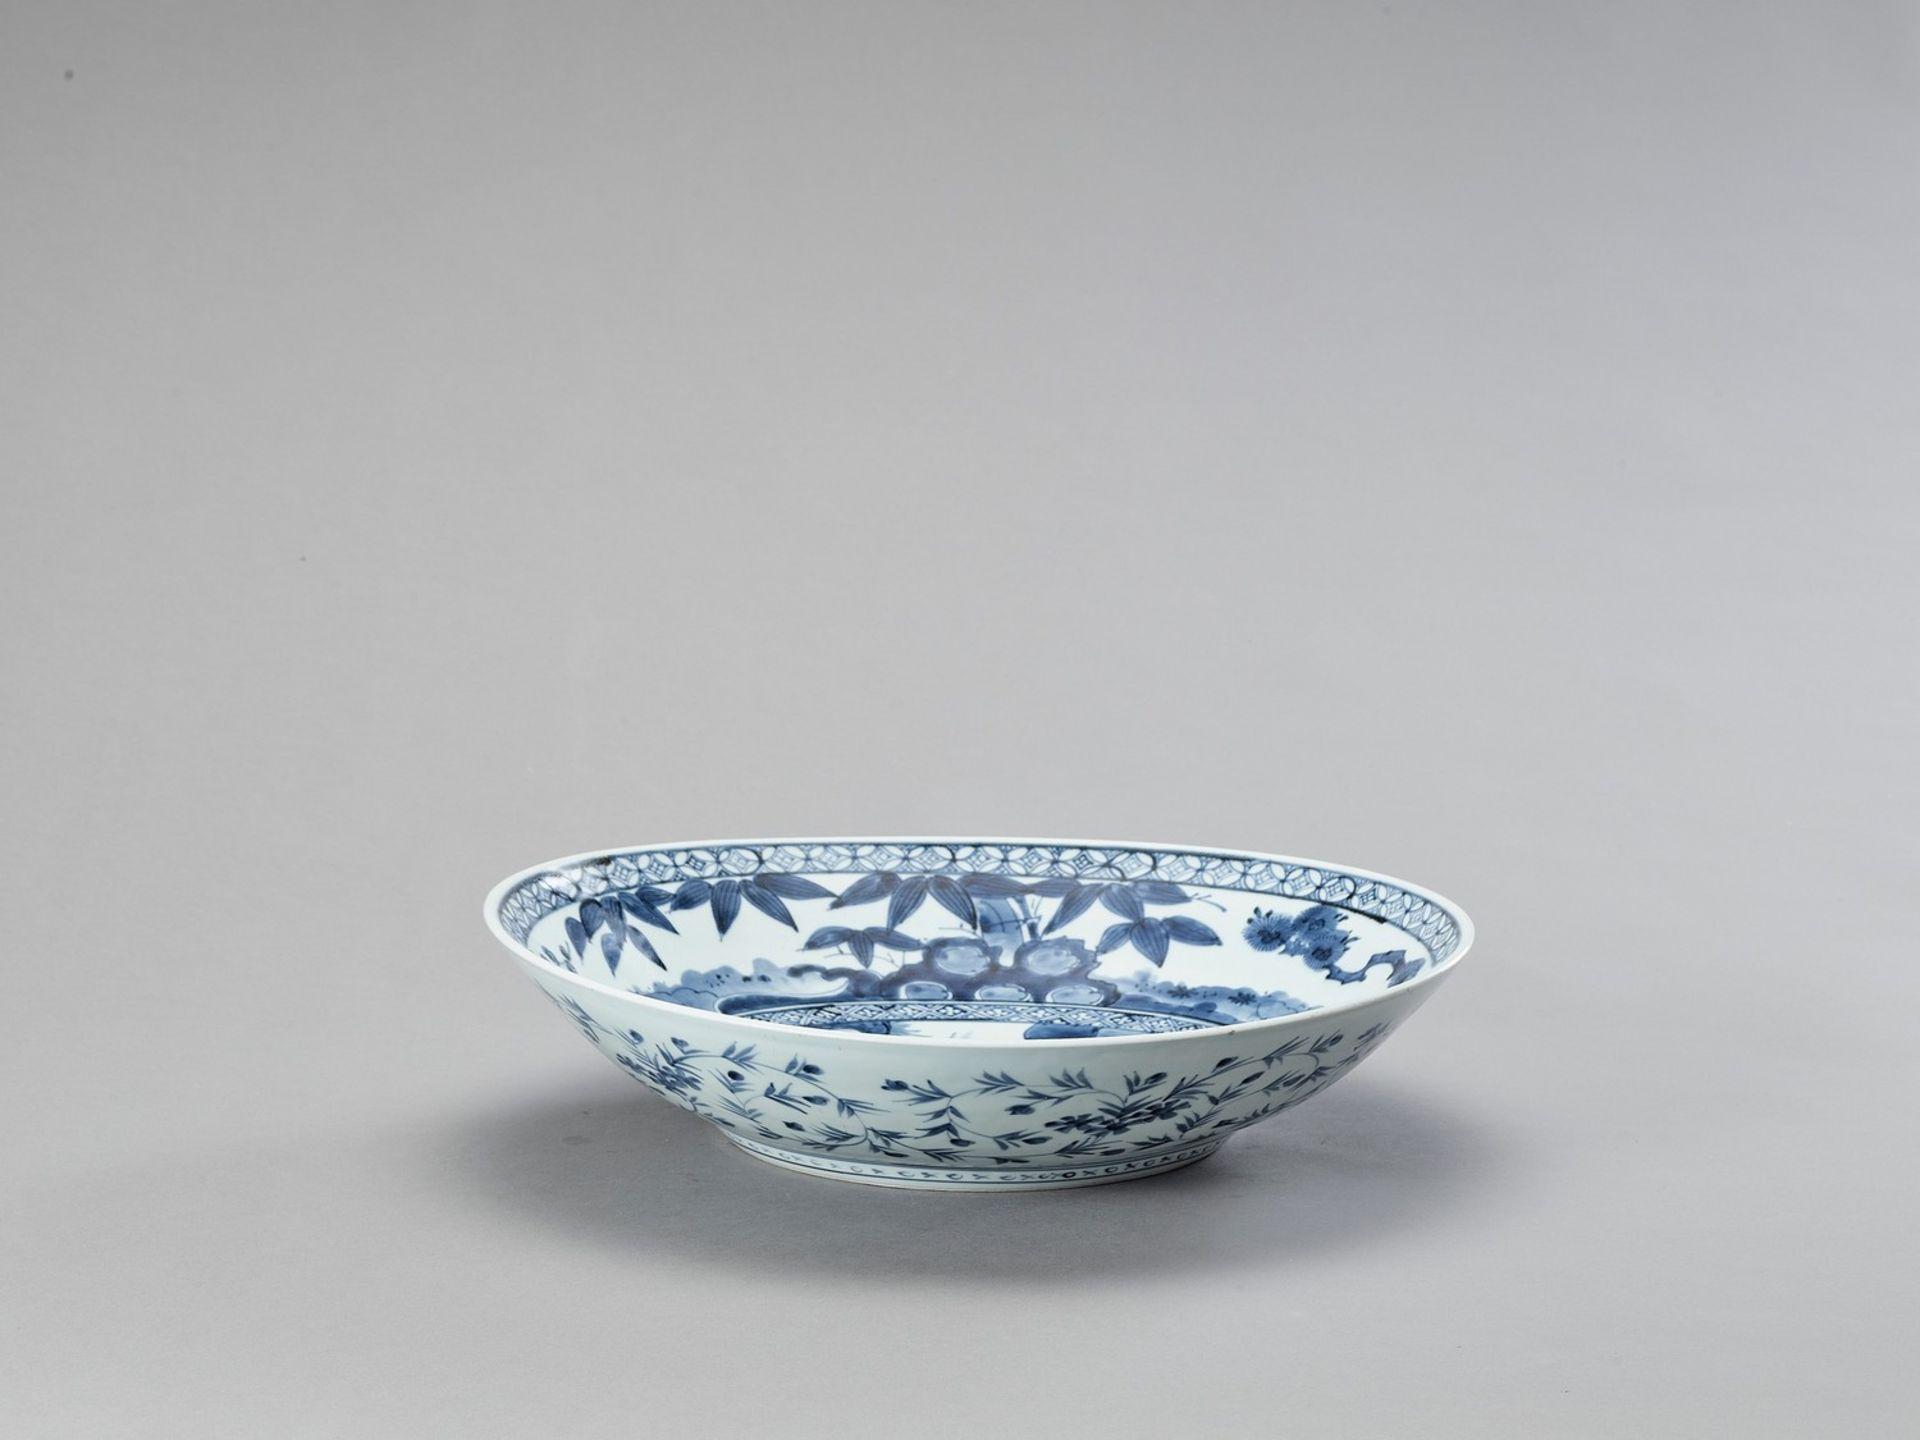 A BLUE AND WHITE ARITA PORCELAIN CHARGER - Bild 4 aus 5